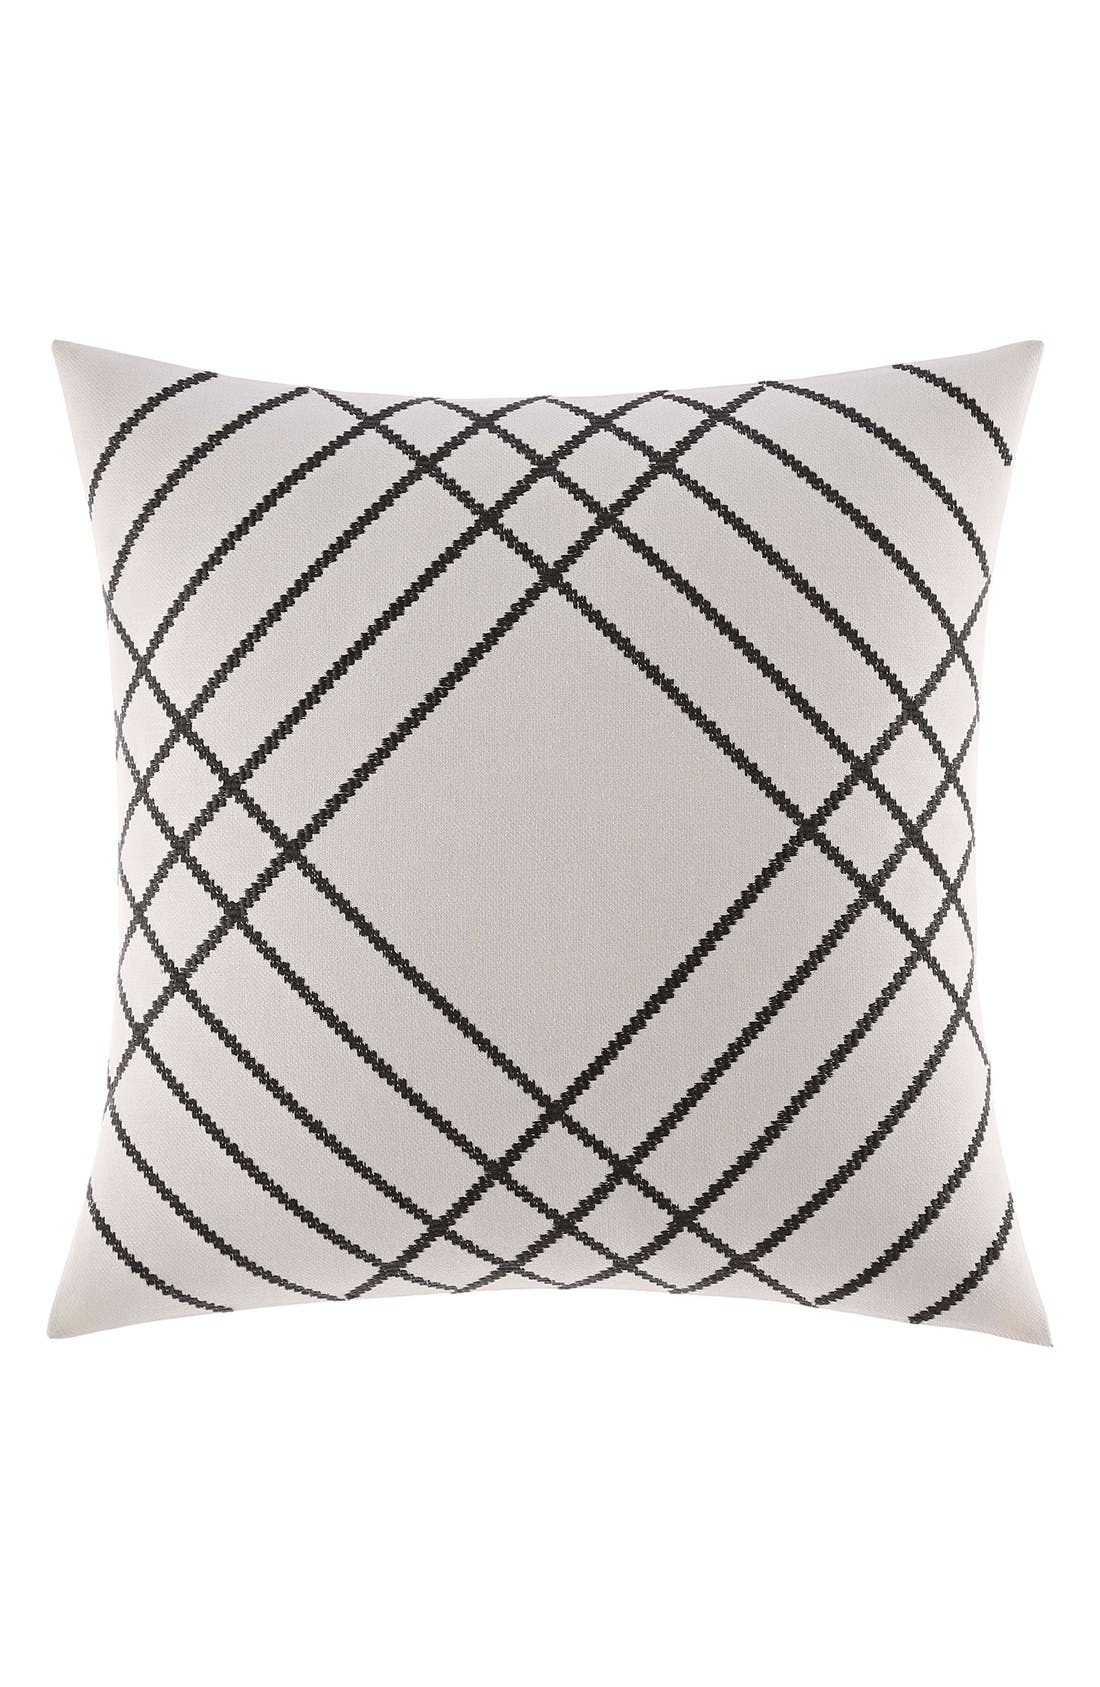 Main Image - Nautica 'Chatfield' Pillow